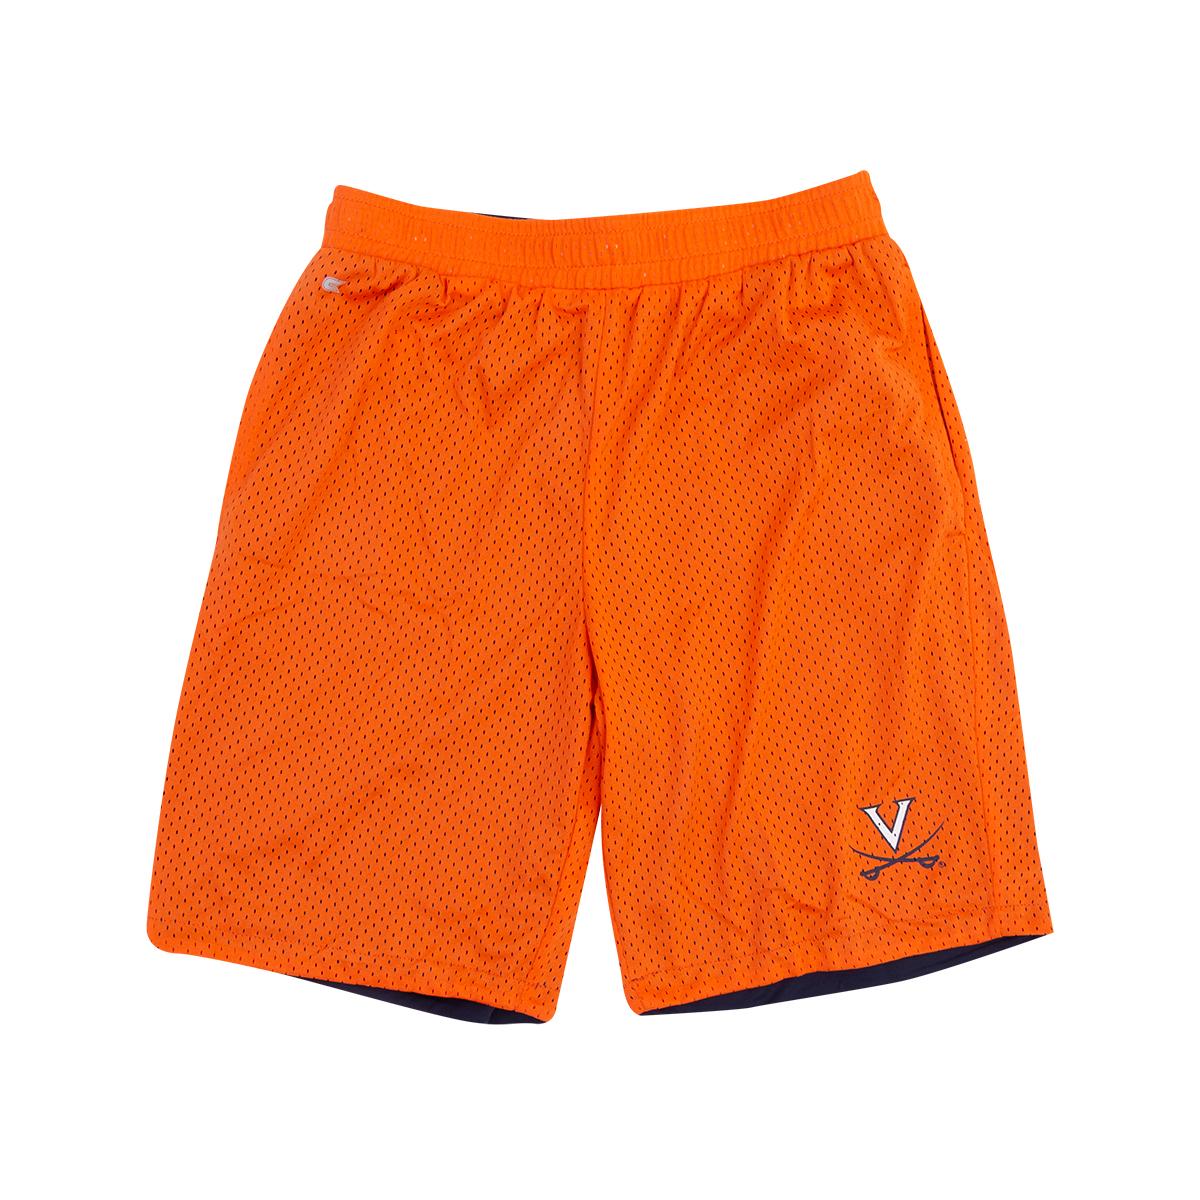 University of Virginia Reversible Shorts